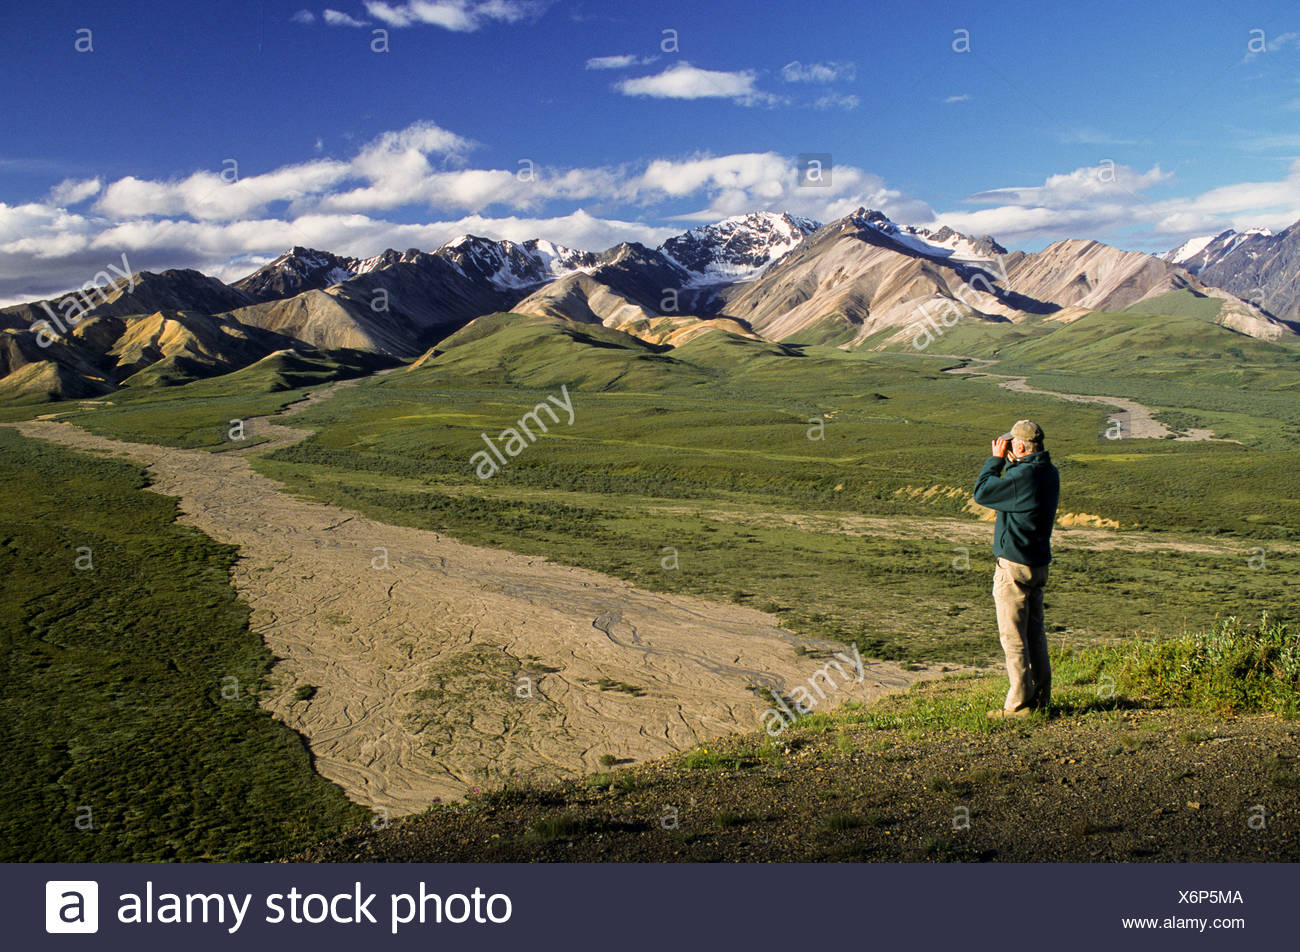 Alaska, Denali National Park. Polychrome Flats. Hiker enjoying the view. - Stock Image